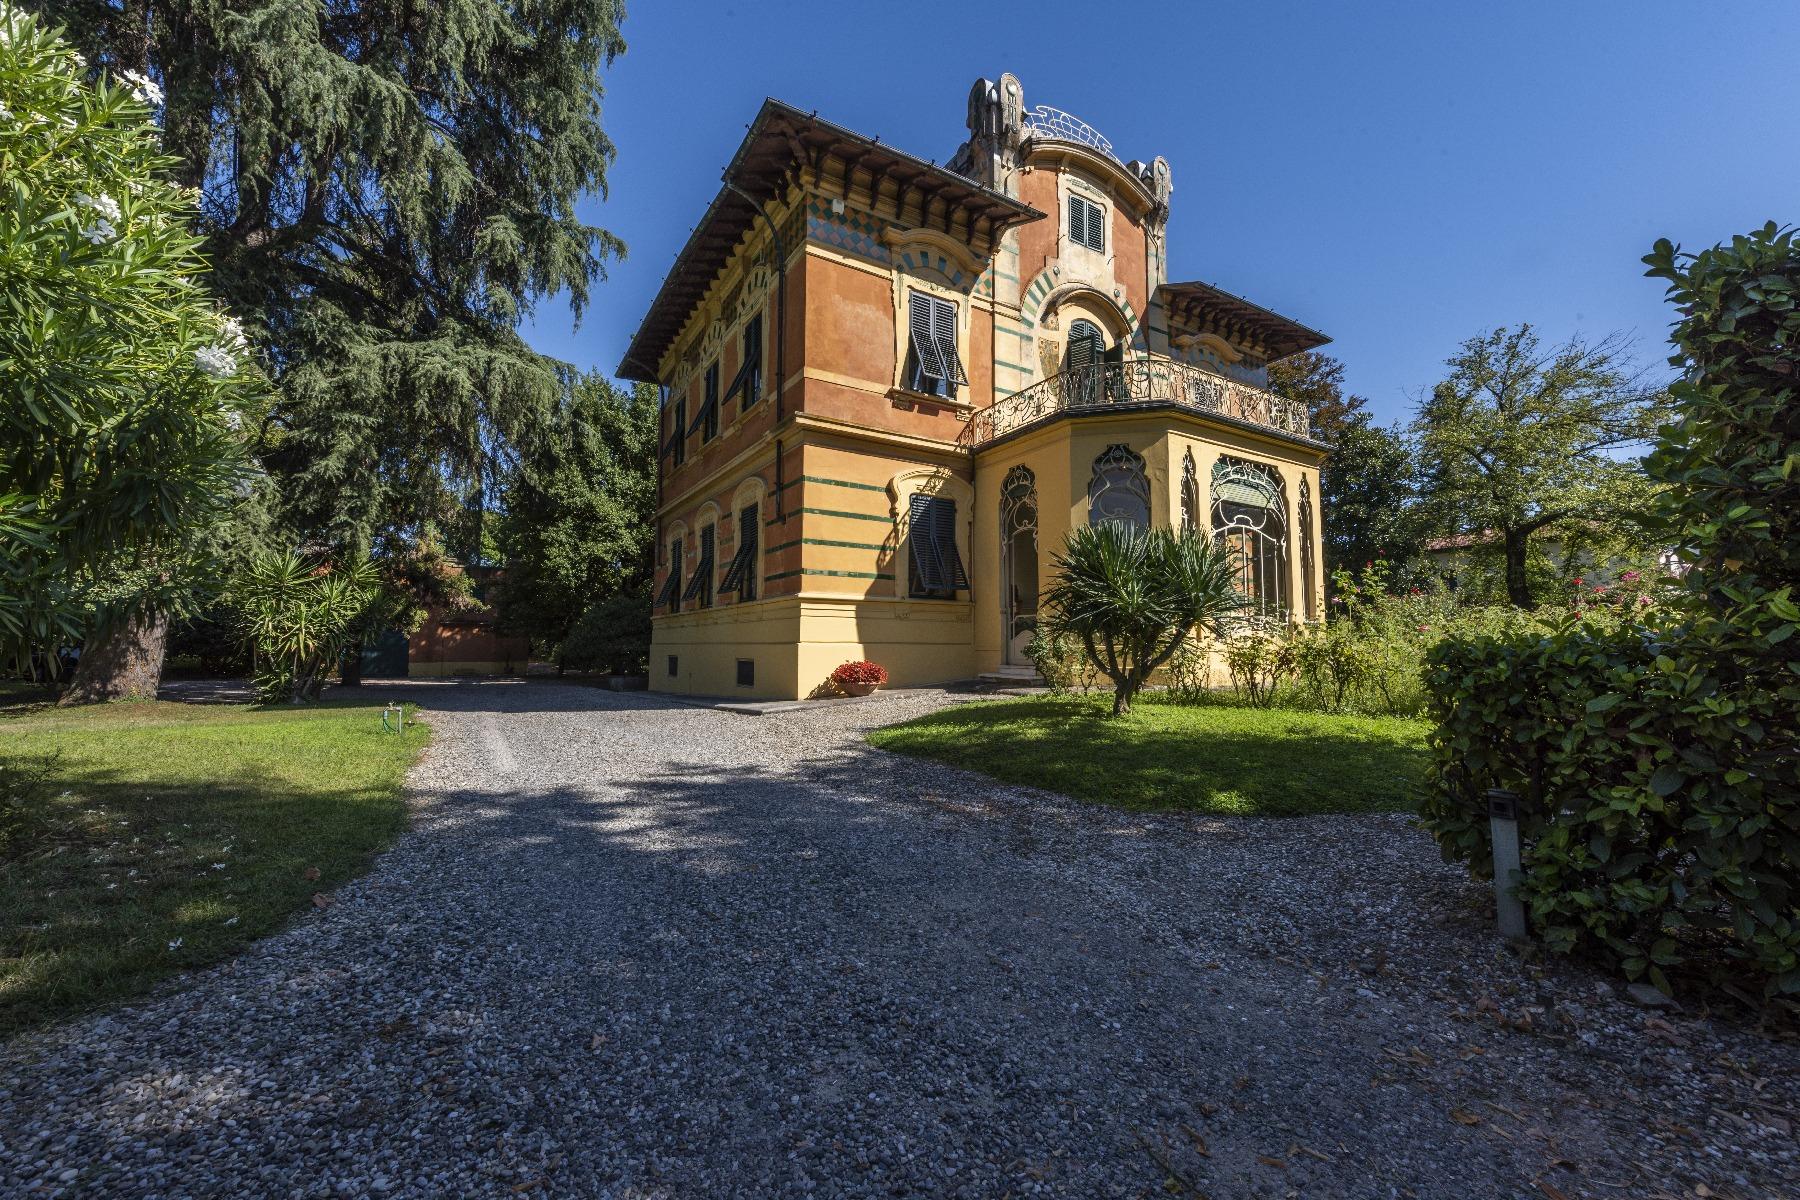 Villa in Vendita a Lucca: 5 locali, 660 mq - Foto 2